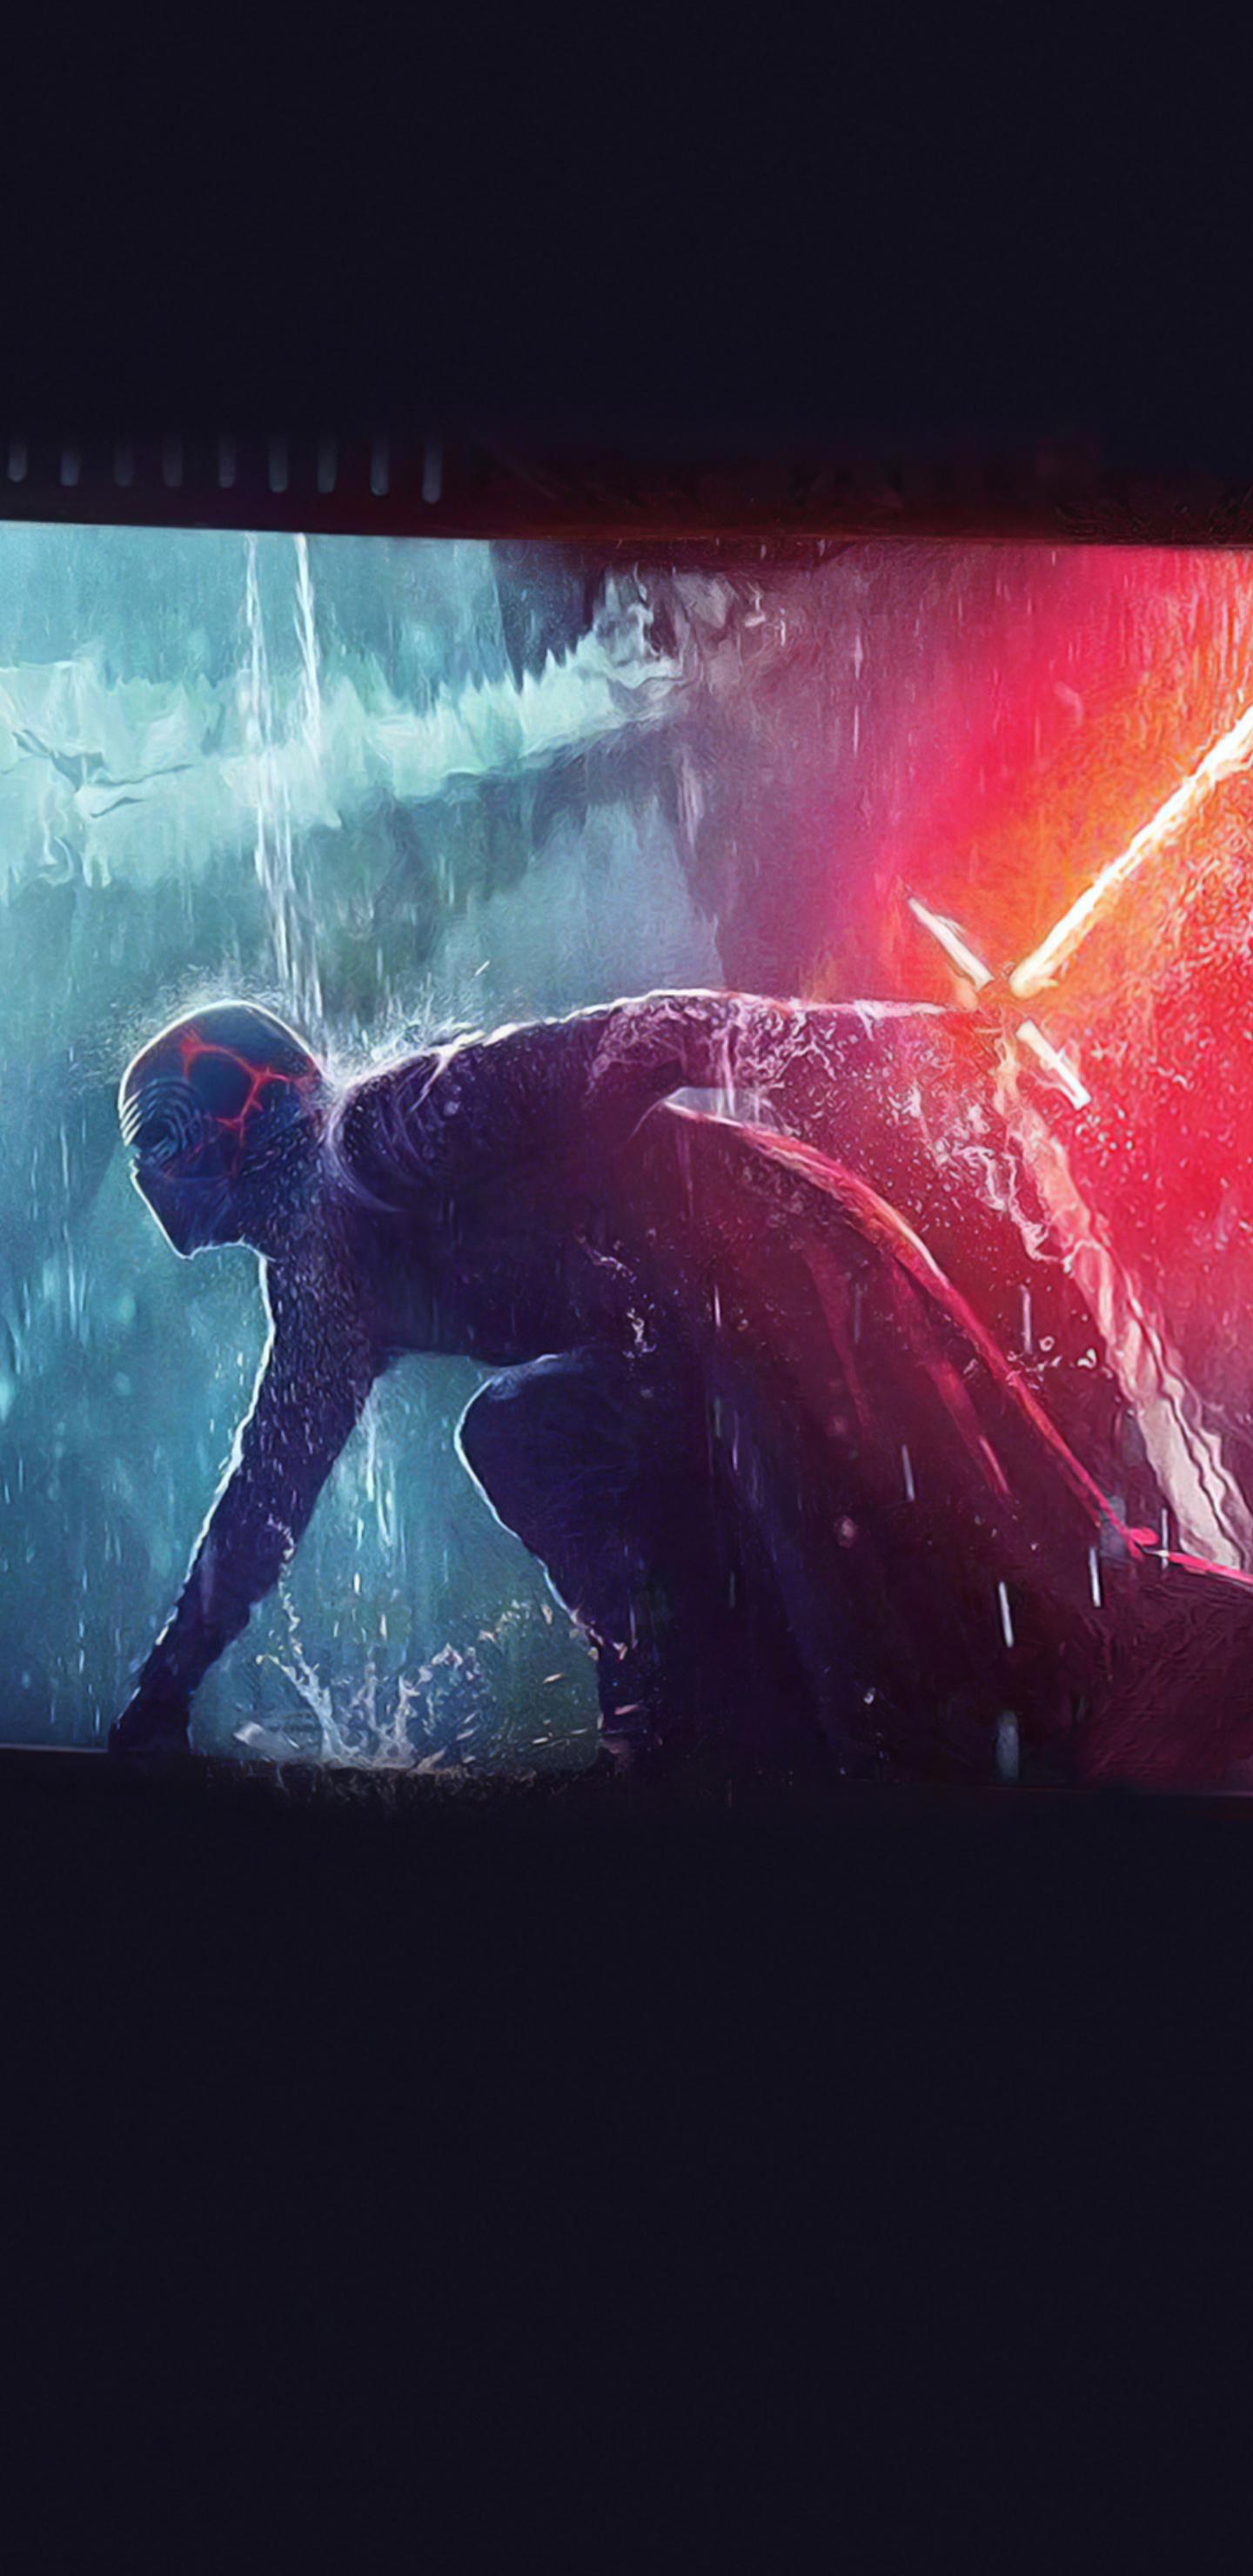 star-wars-the-rise-of-skywalker-rey-vs-kylo-ren-ps.jpg